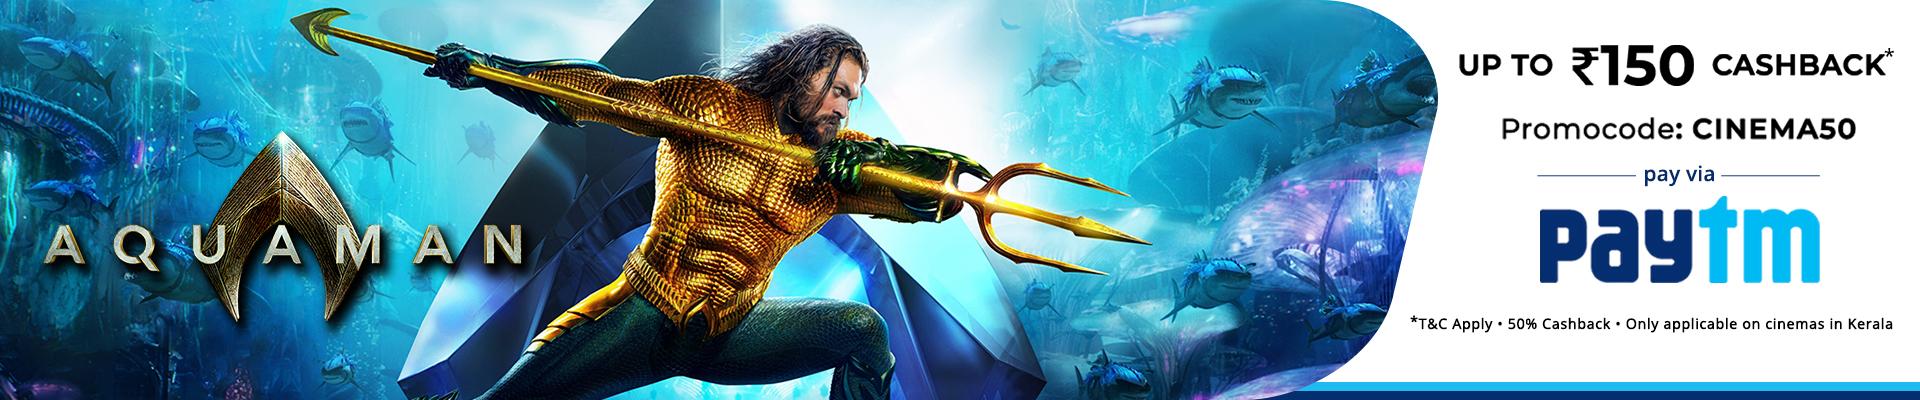 Aquaman banner(kerala)